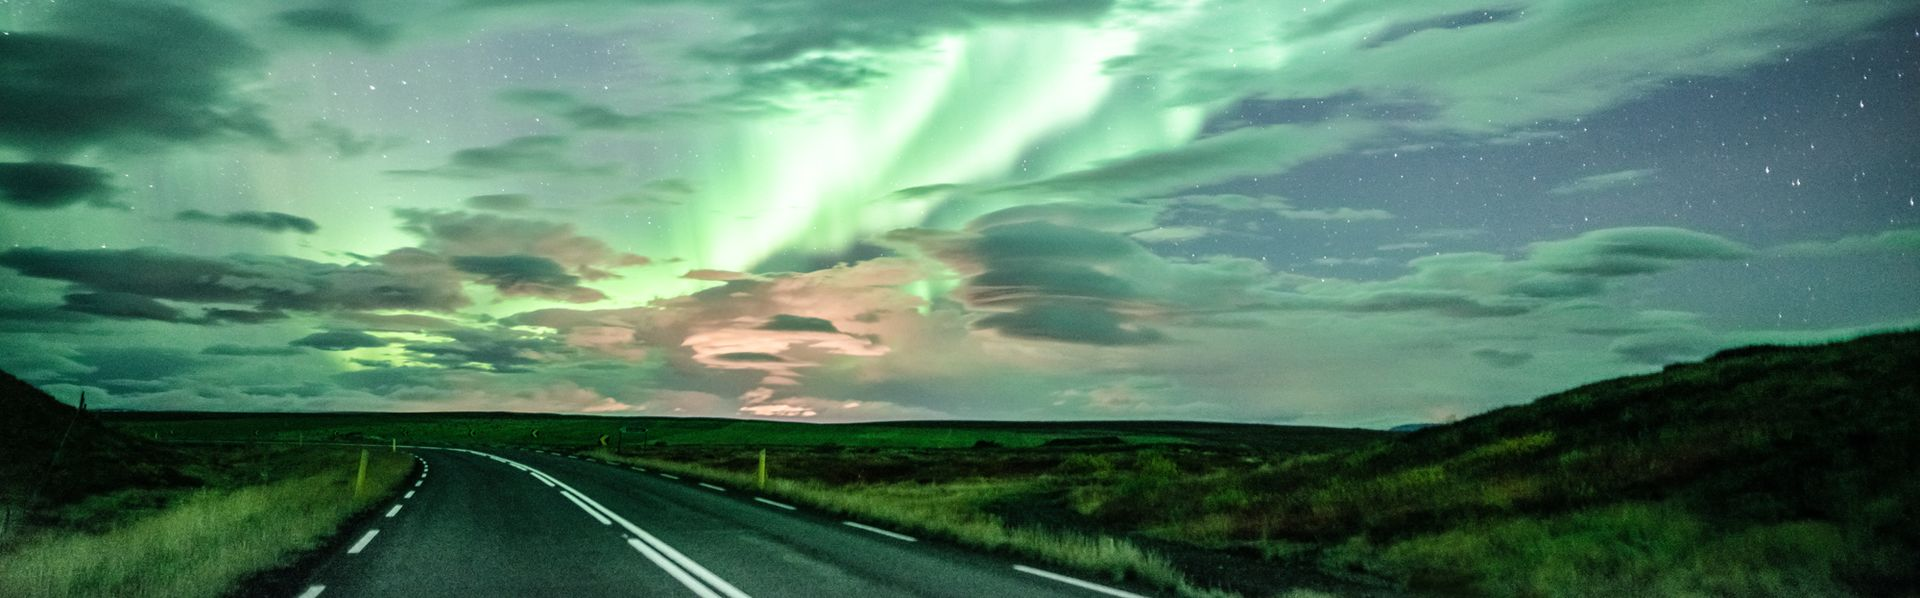 Les phénomènes atmosphériques. [© Tobilander - Fotolia]